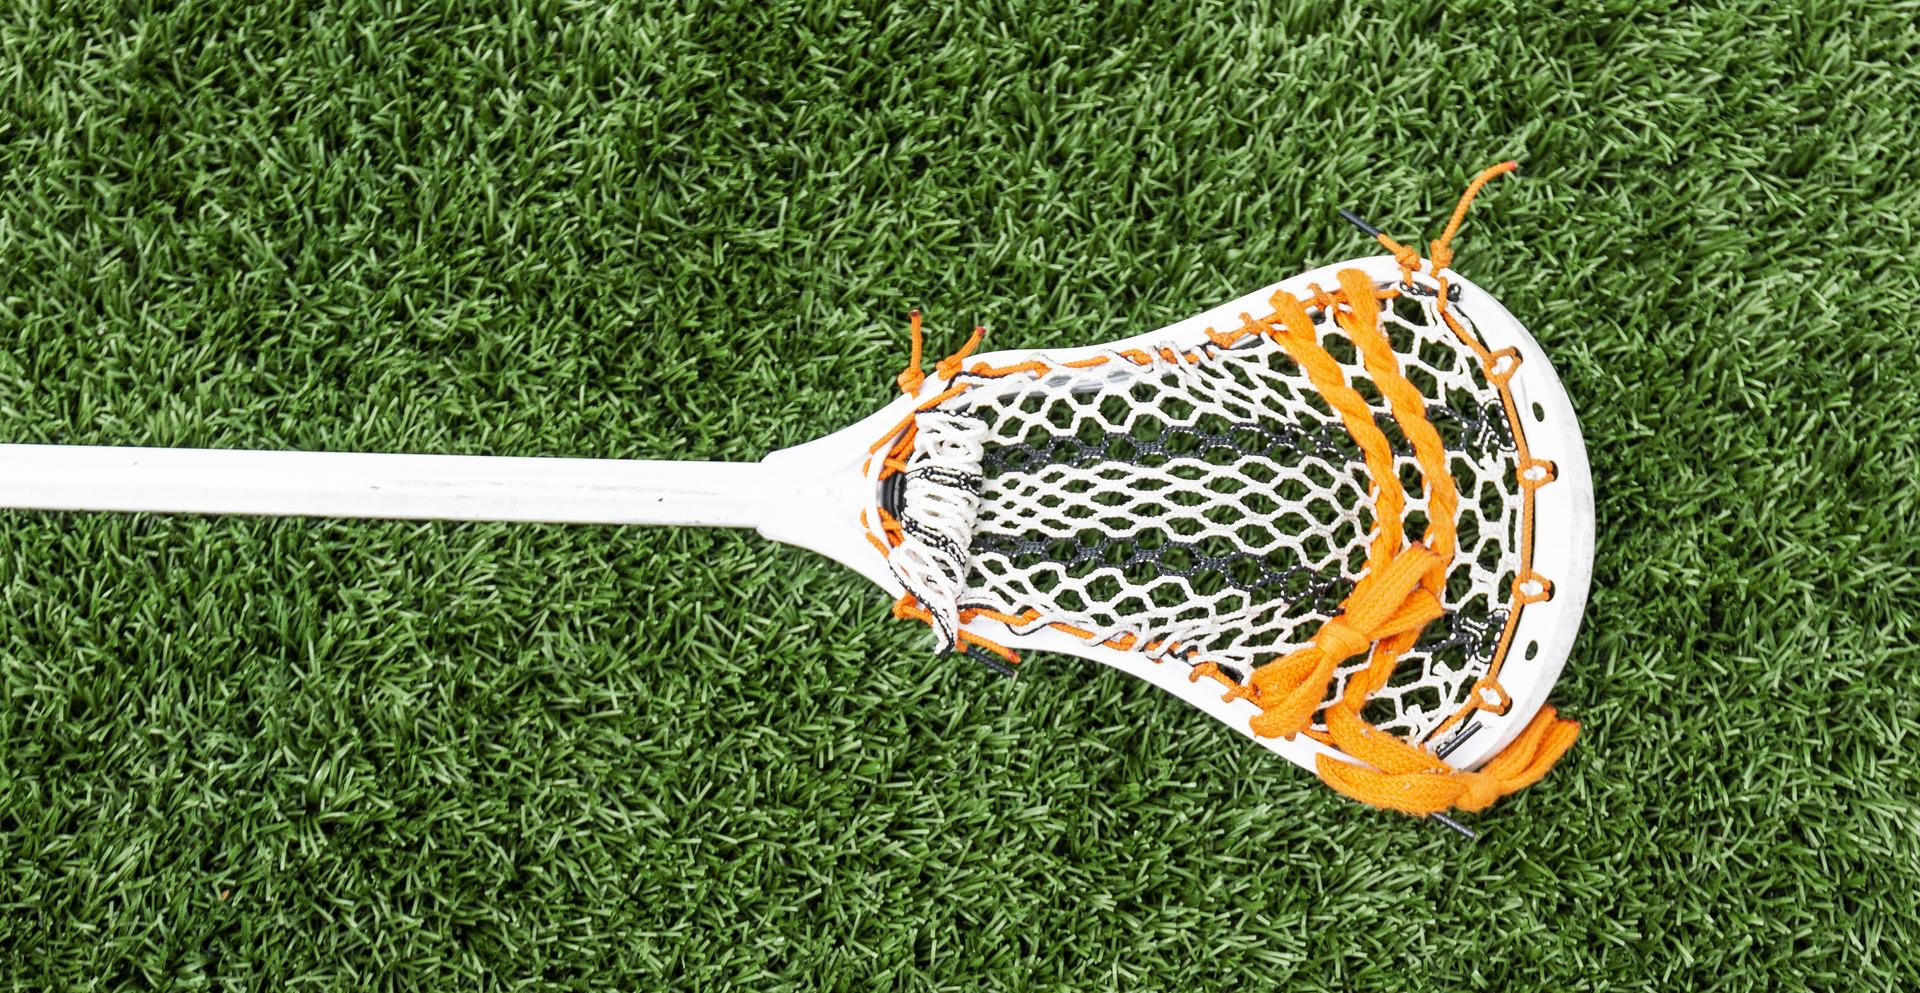 Lacrosse stick generic